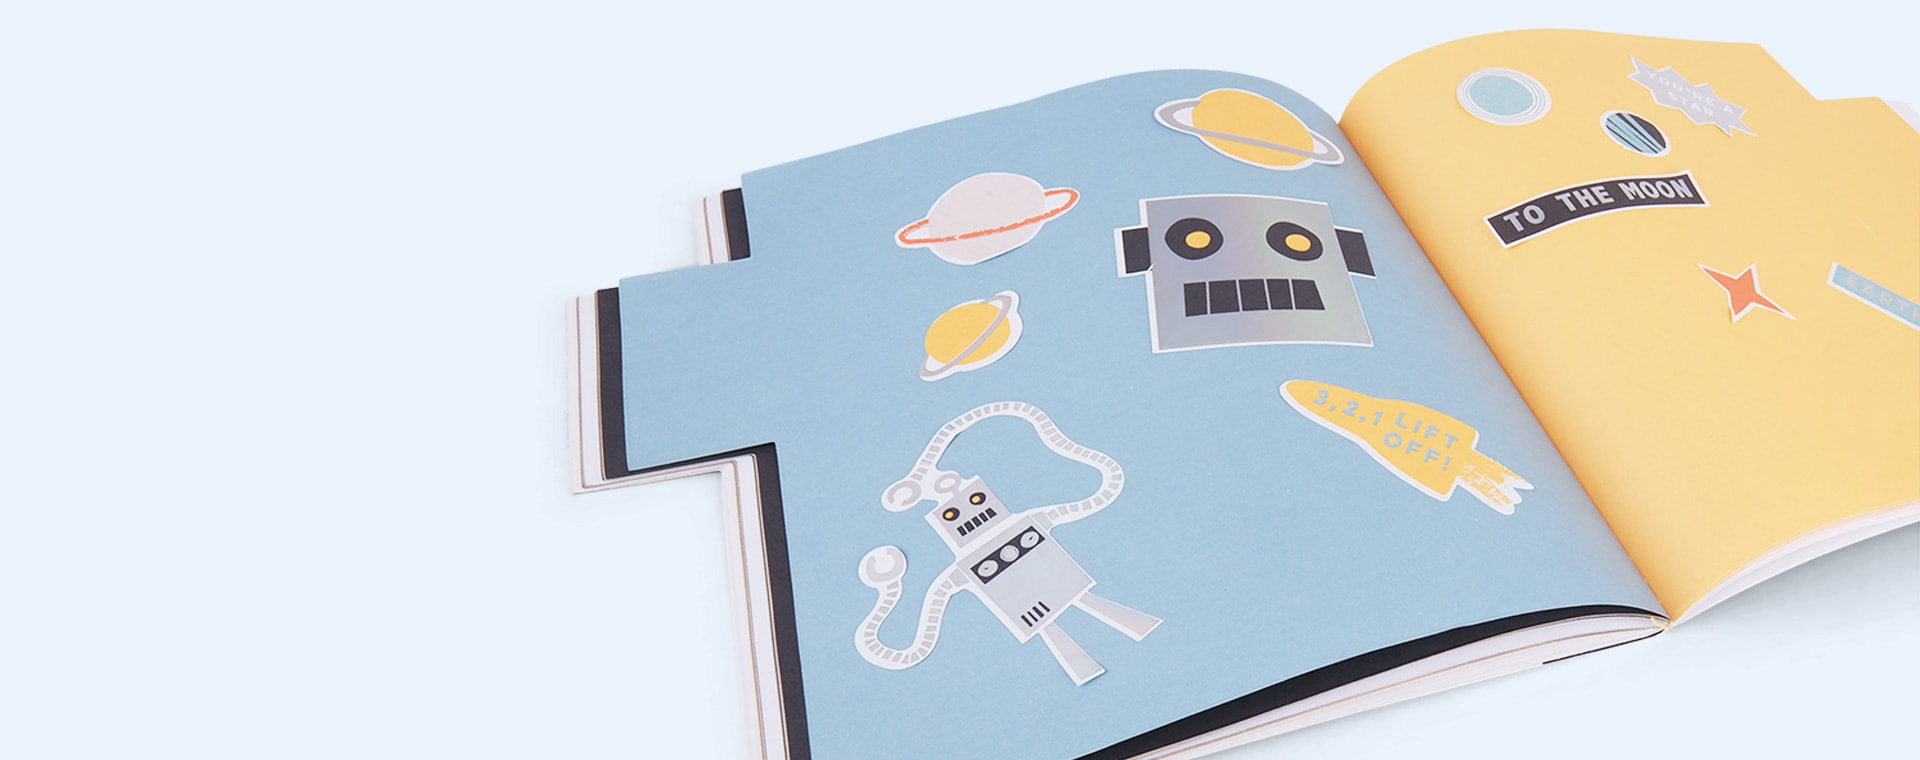 Robot Meri Meri Sticker And Sketchbook